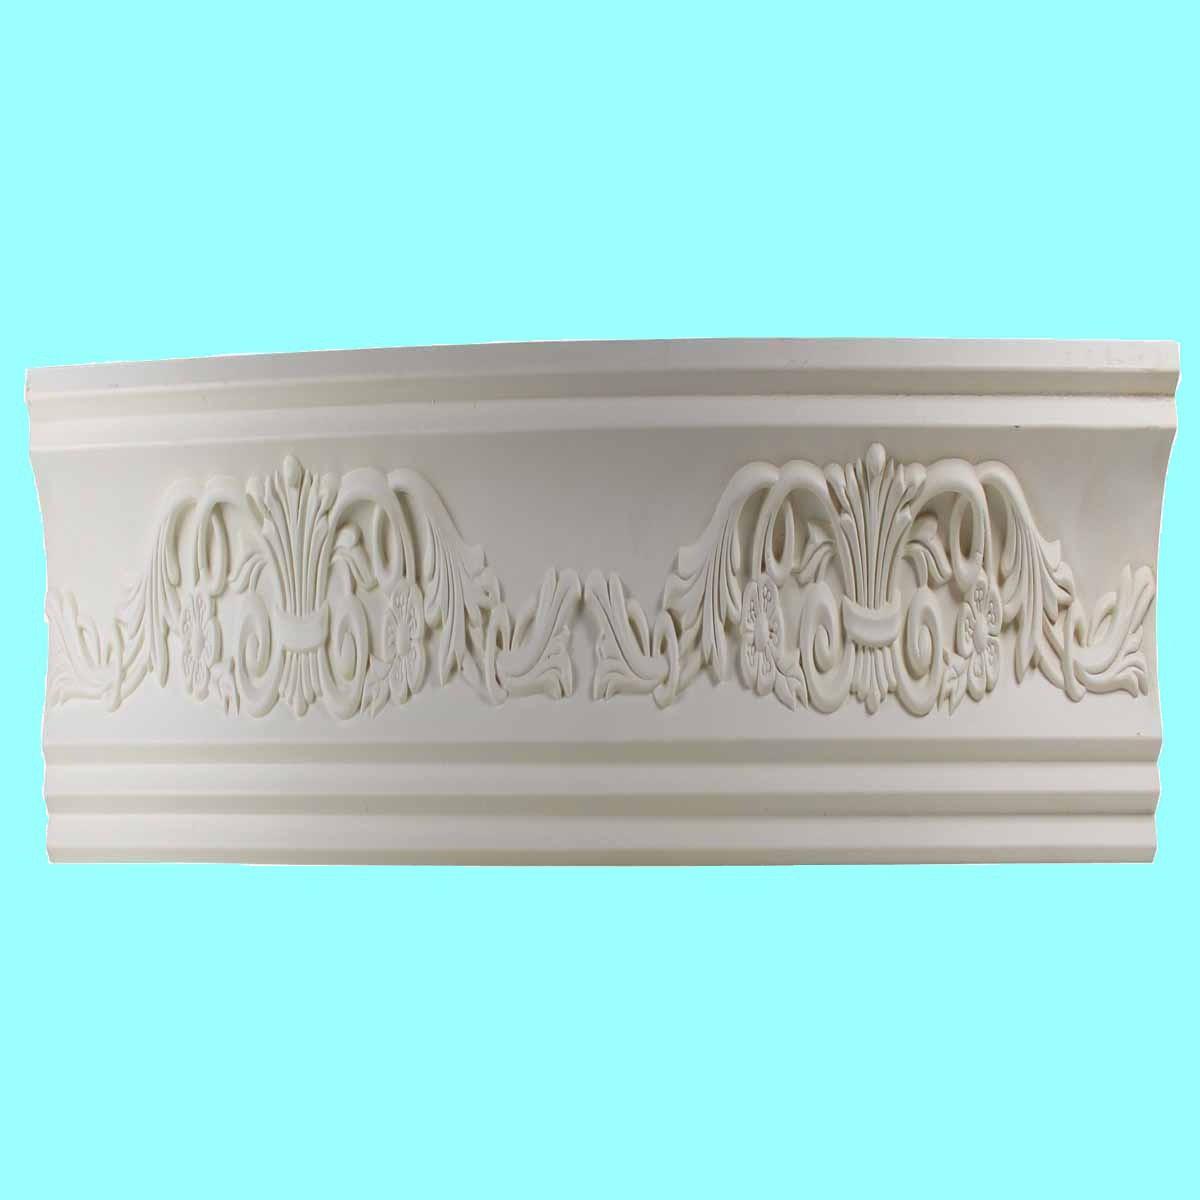 Cornice White Urethane 24 Sample of 11386 Cornice Cornice Moulding Cornice Molding